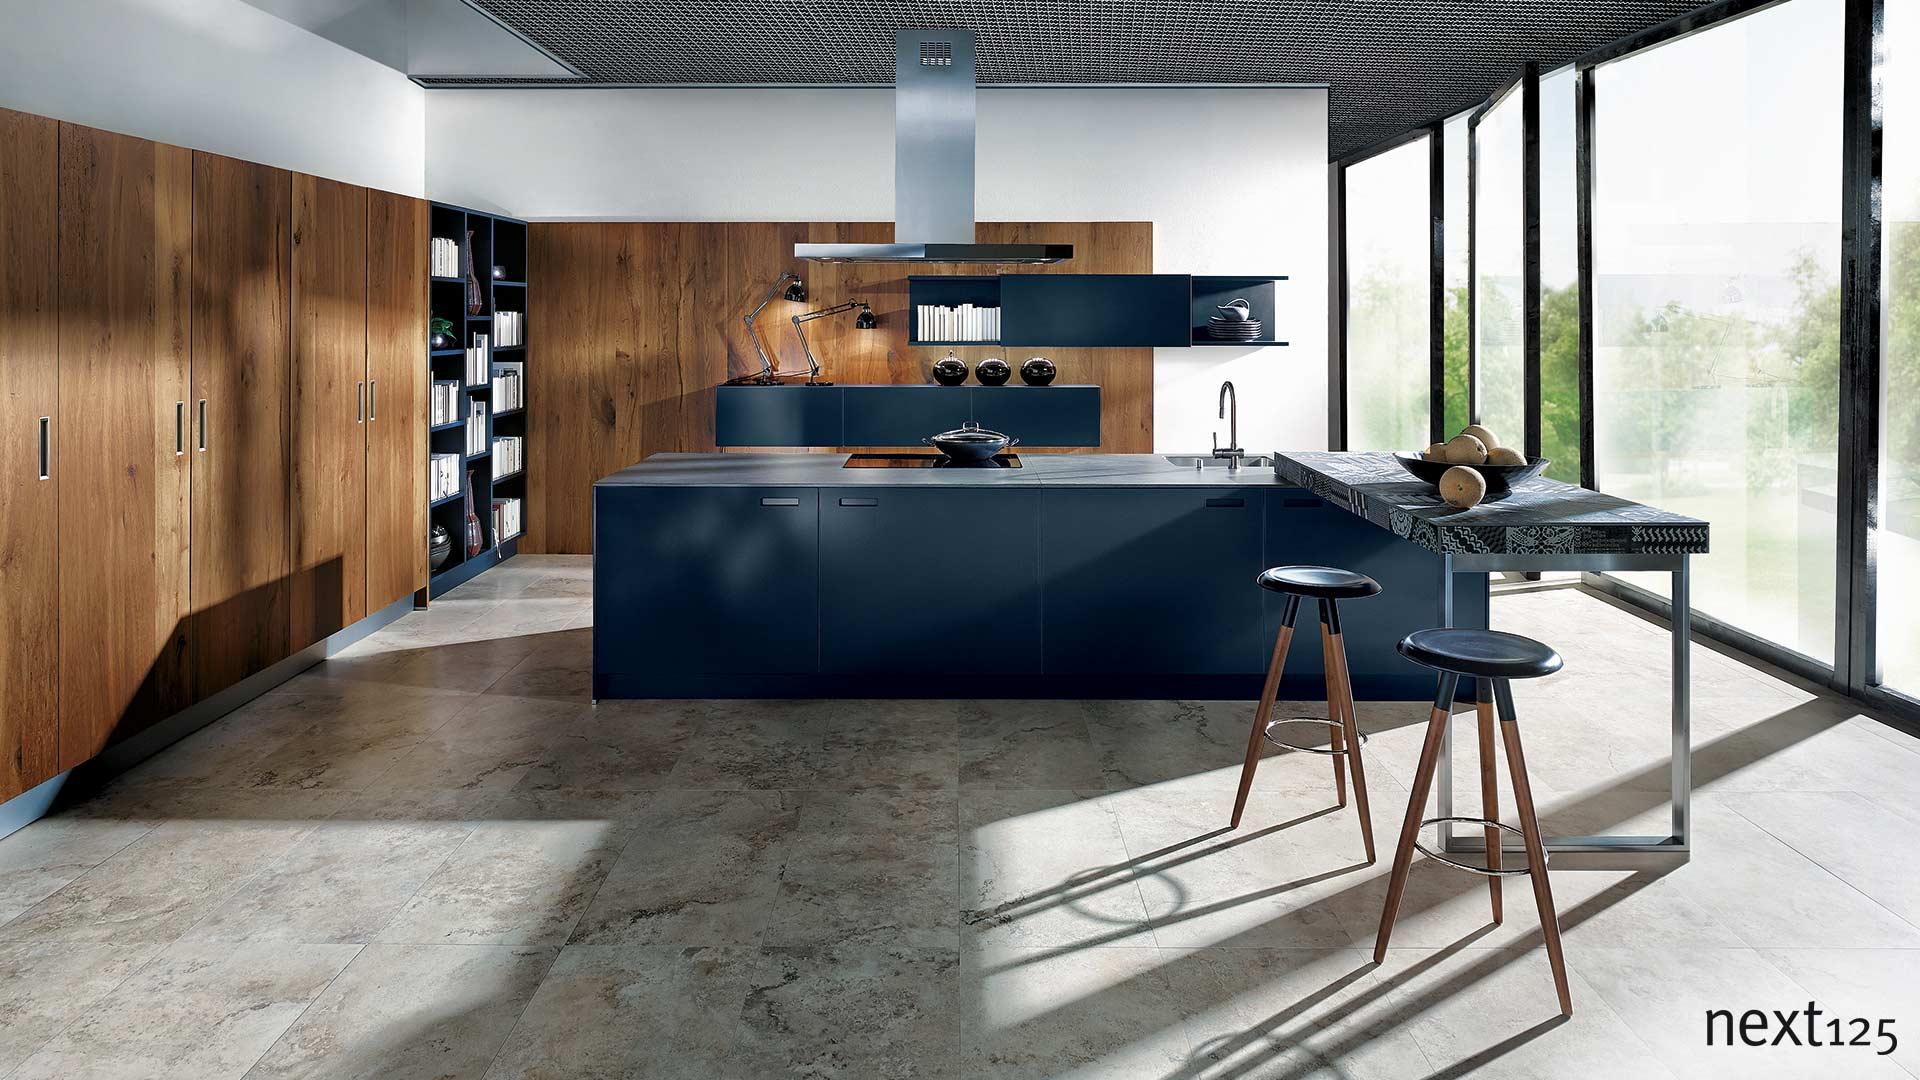 kchenstudio wiesbaden good affordable finest large size of provision rheumri mit increble. Black Bedroom Furniture Sets. Home Design Ideas